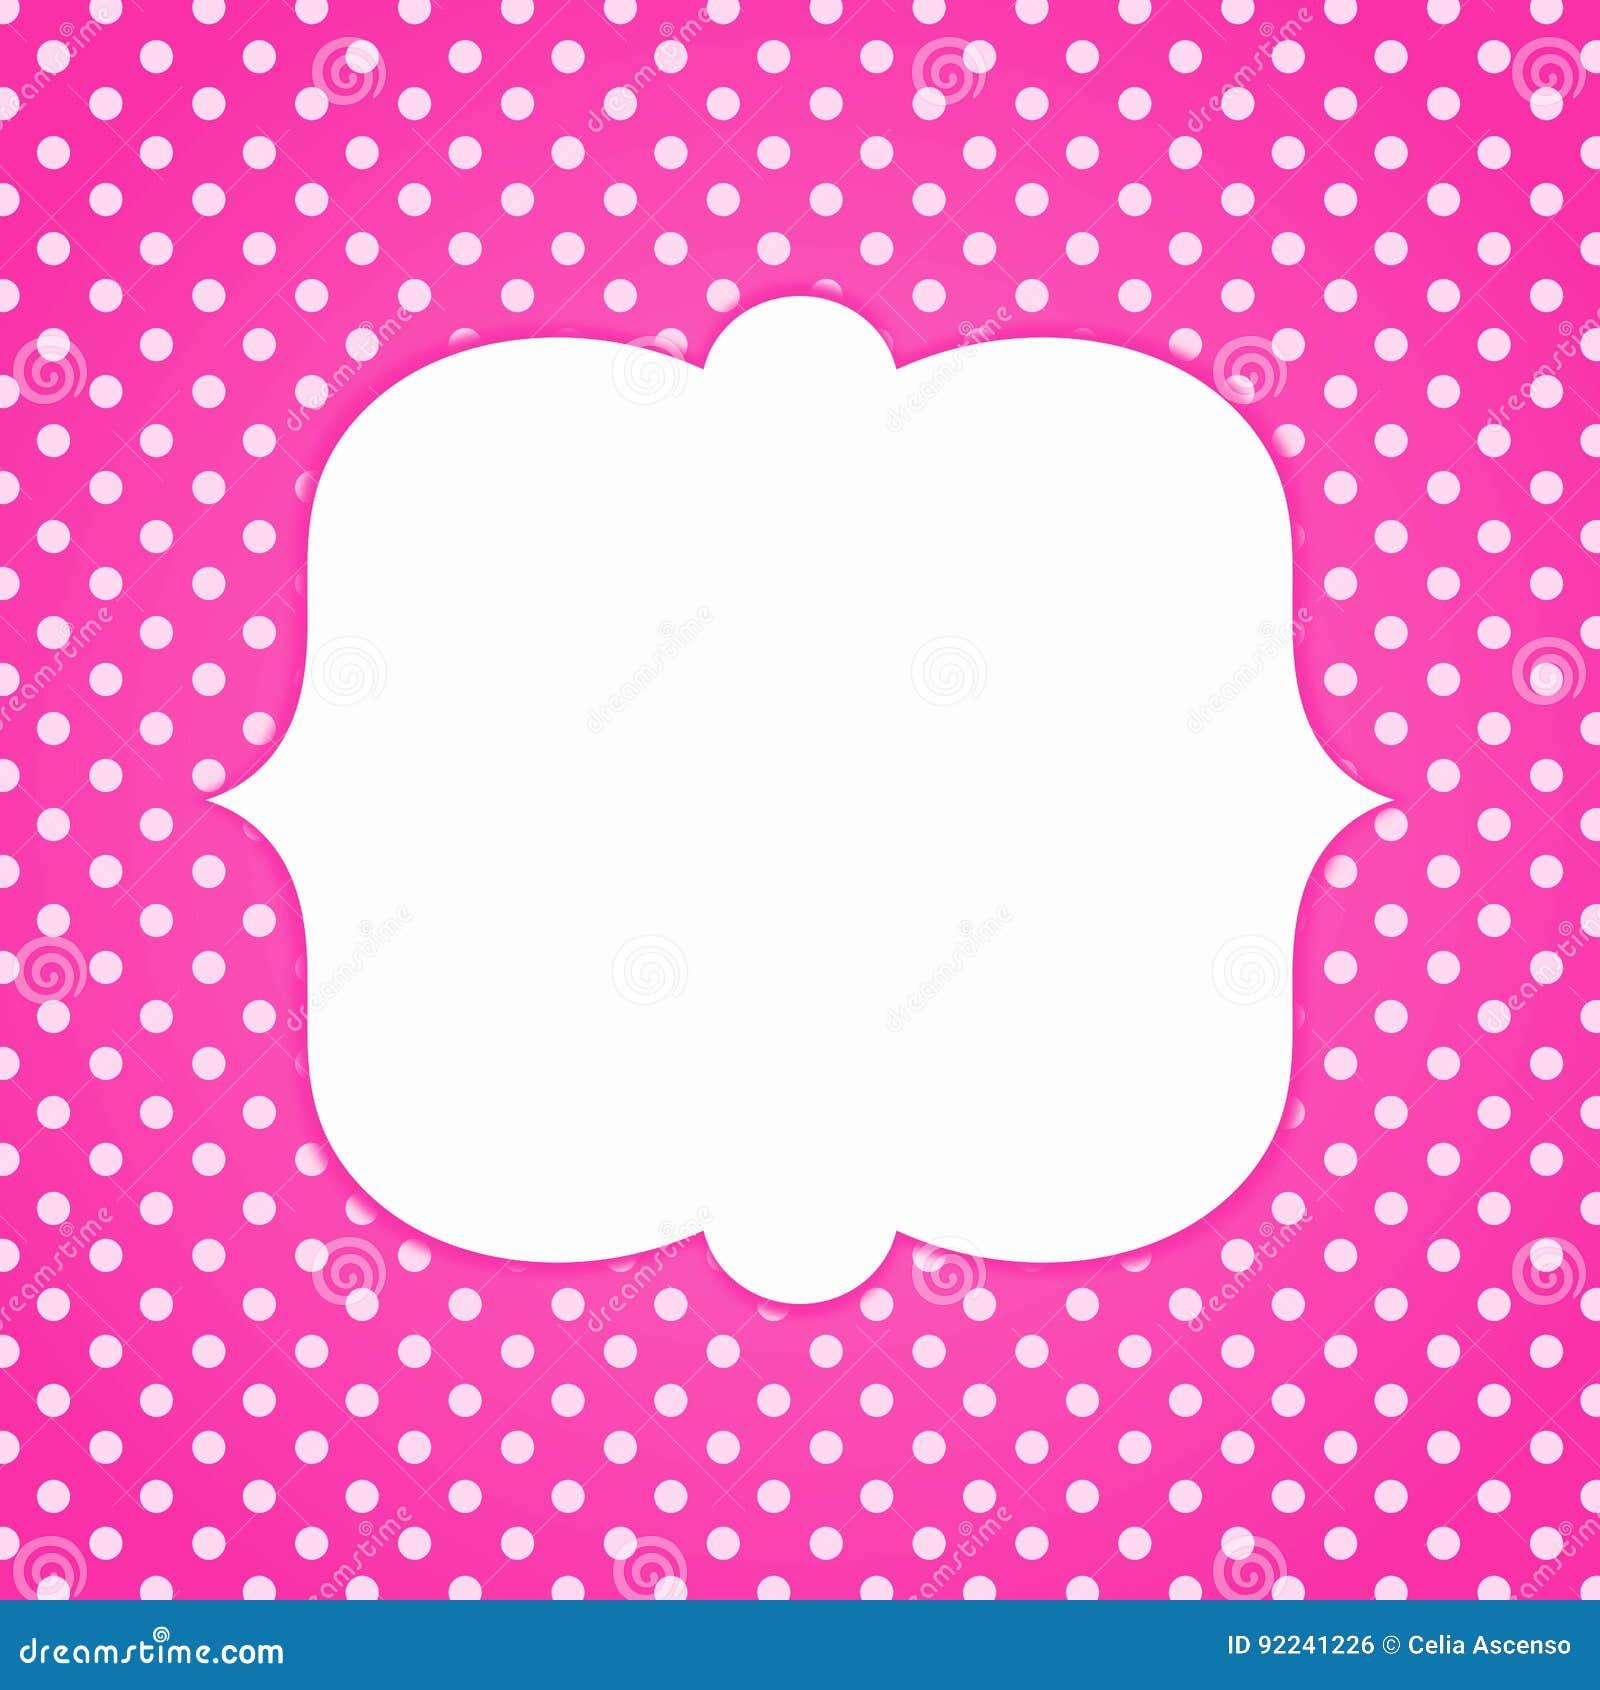 pink polka dots invitation card stock illustration illustration of